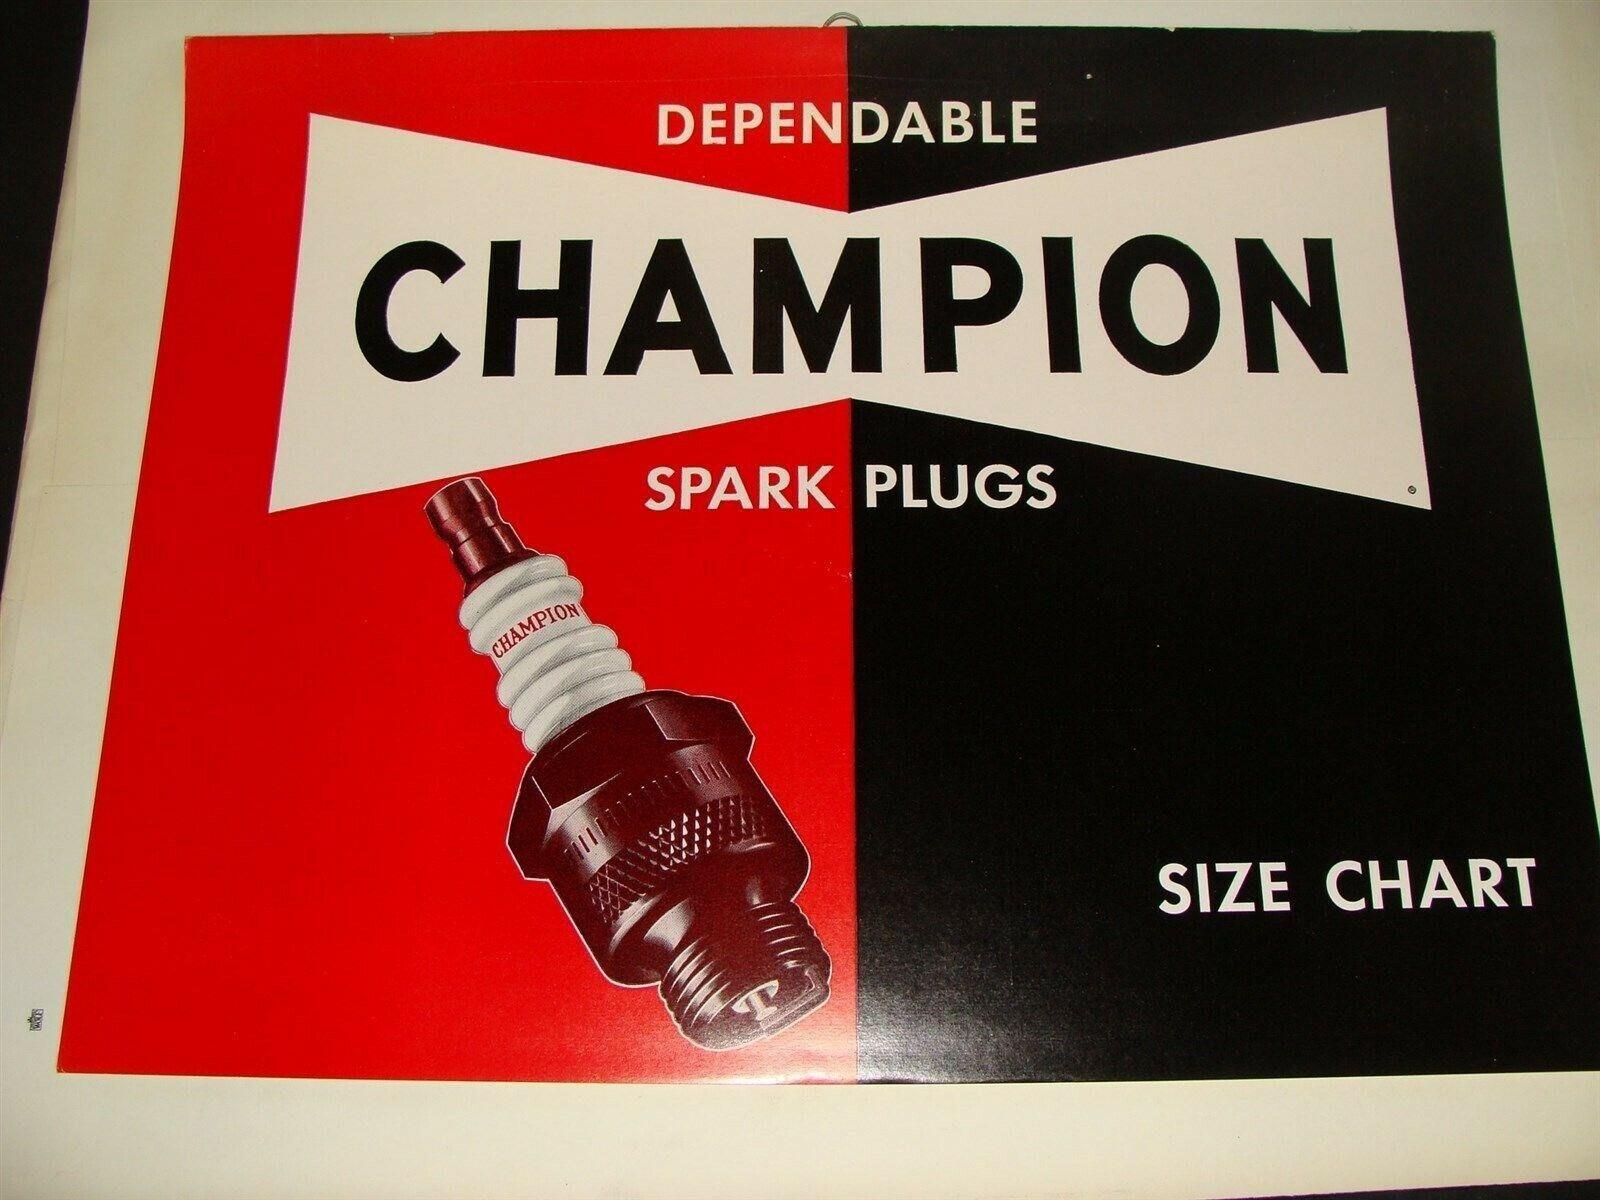 1957 Champion Spark Plugs Size Chart Sign Garage Catalog NOT Metal or Porcelain